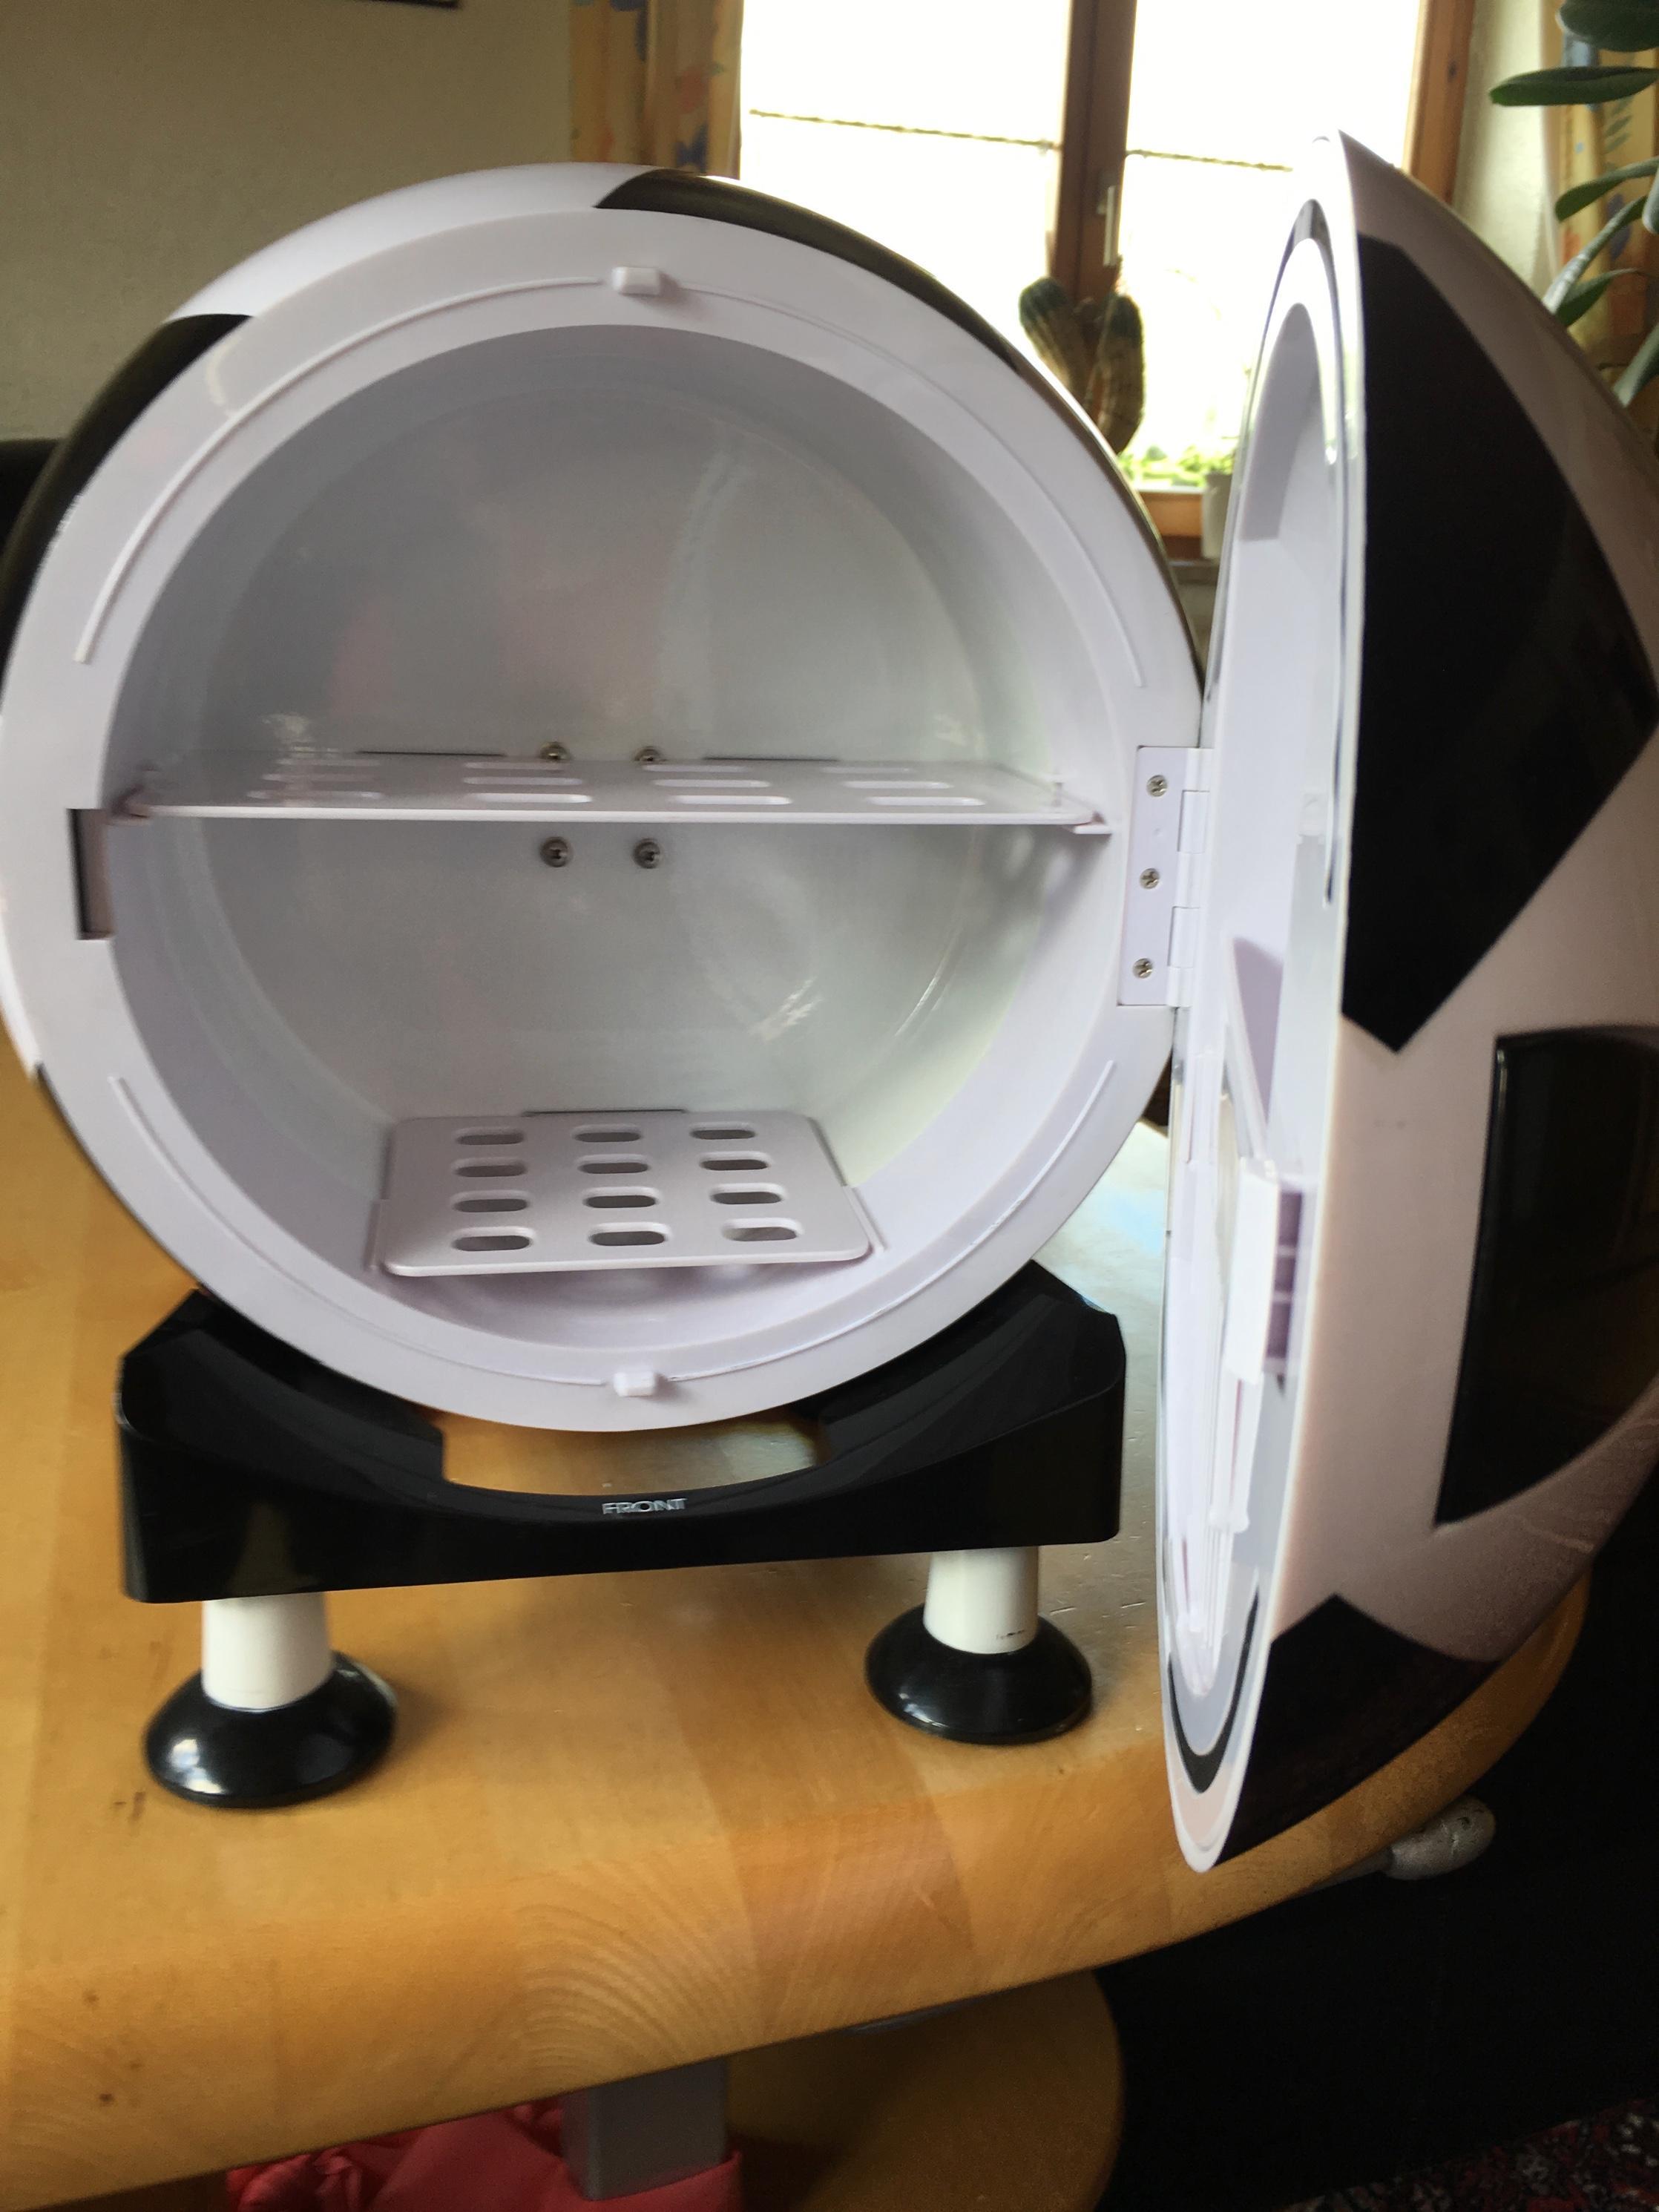 Mini Kühlschrank Fussball : Angebot mini kühlschrank fußball in scheidegg um u ac